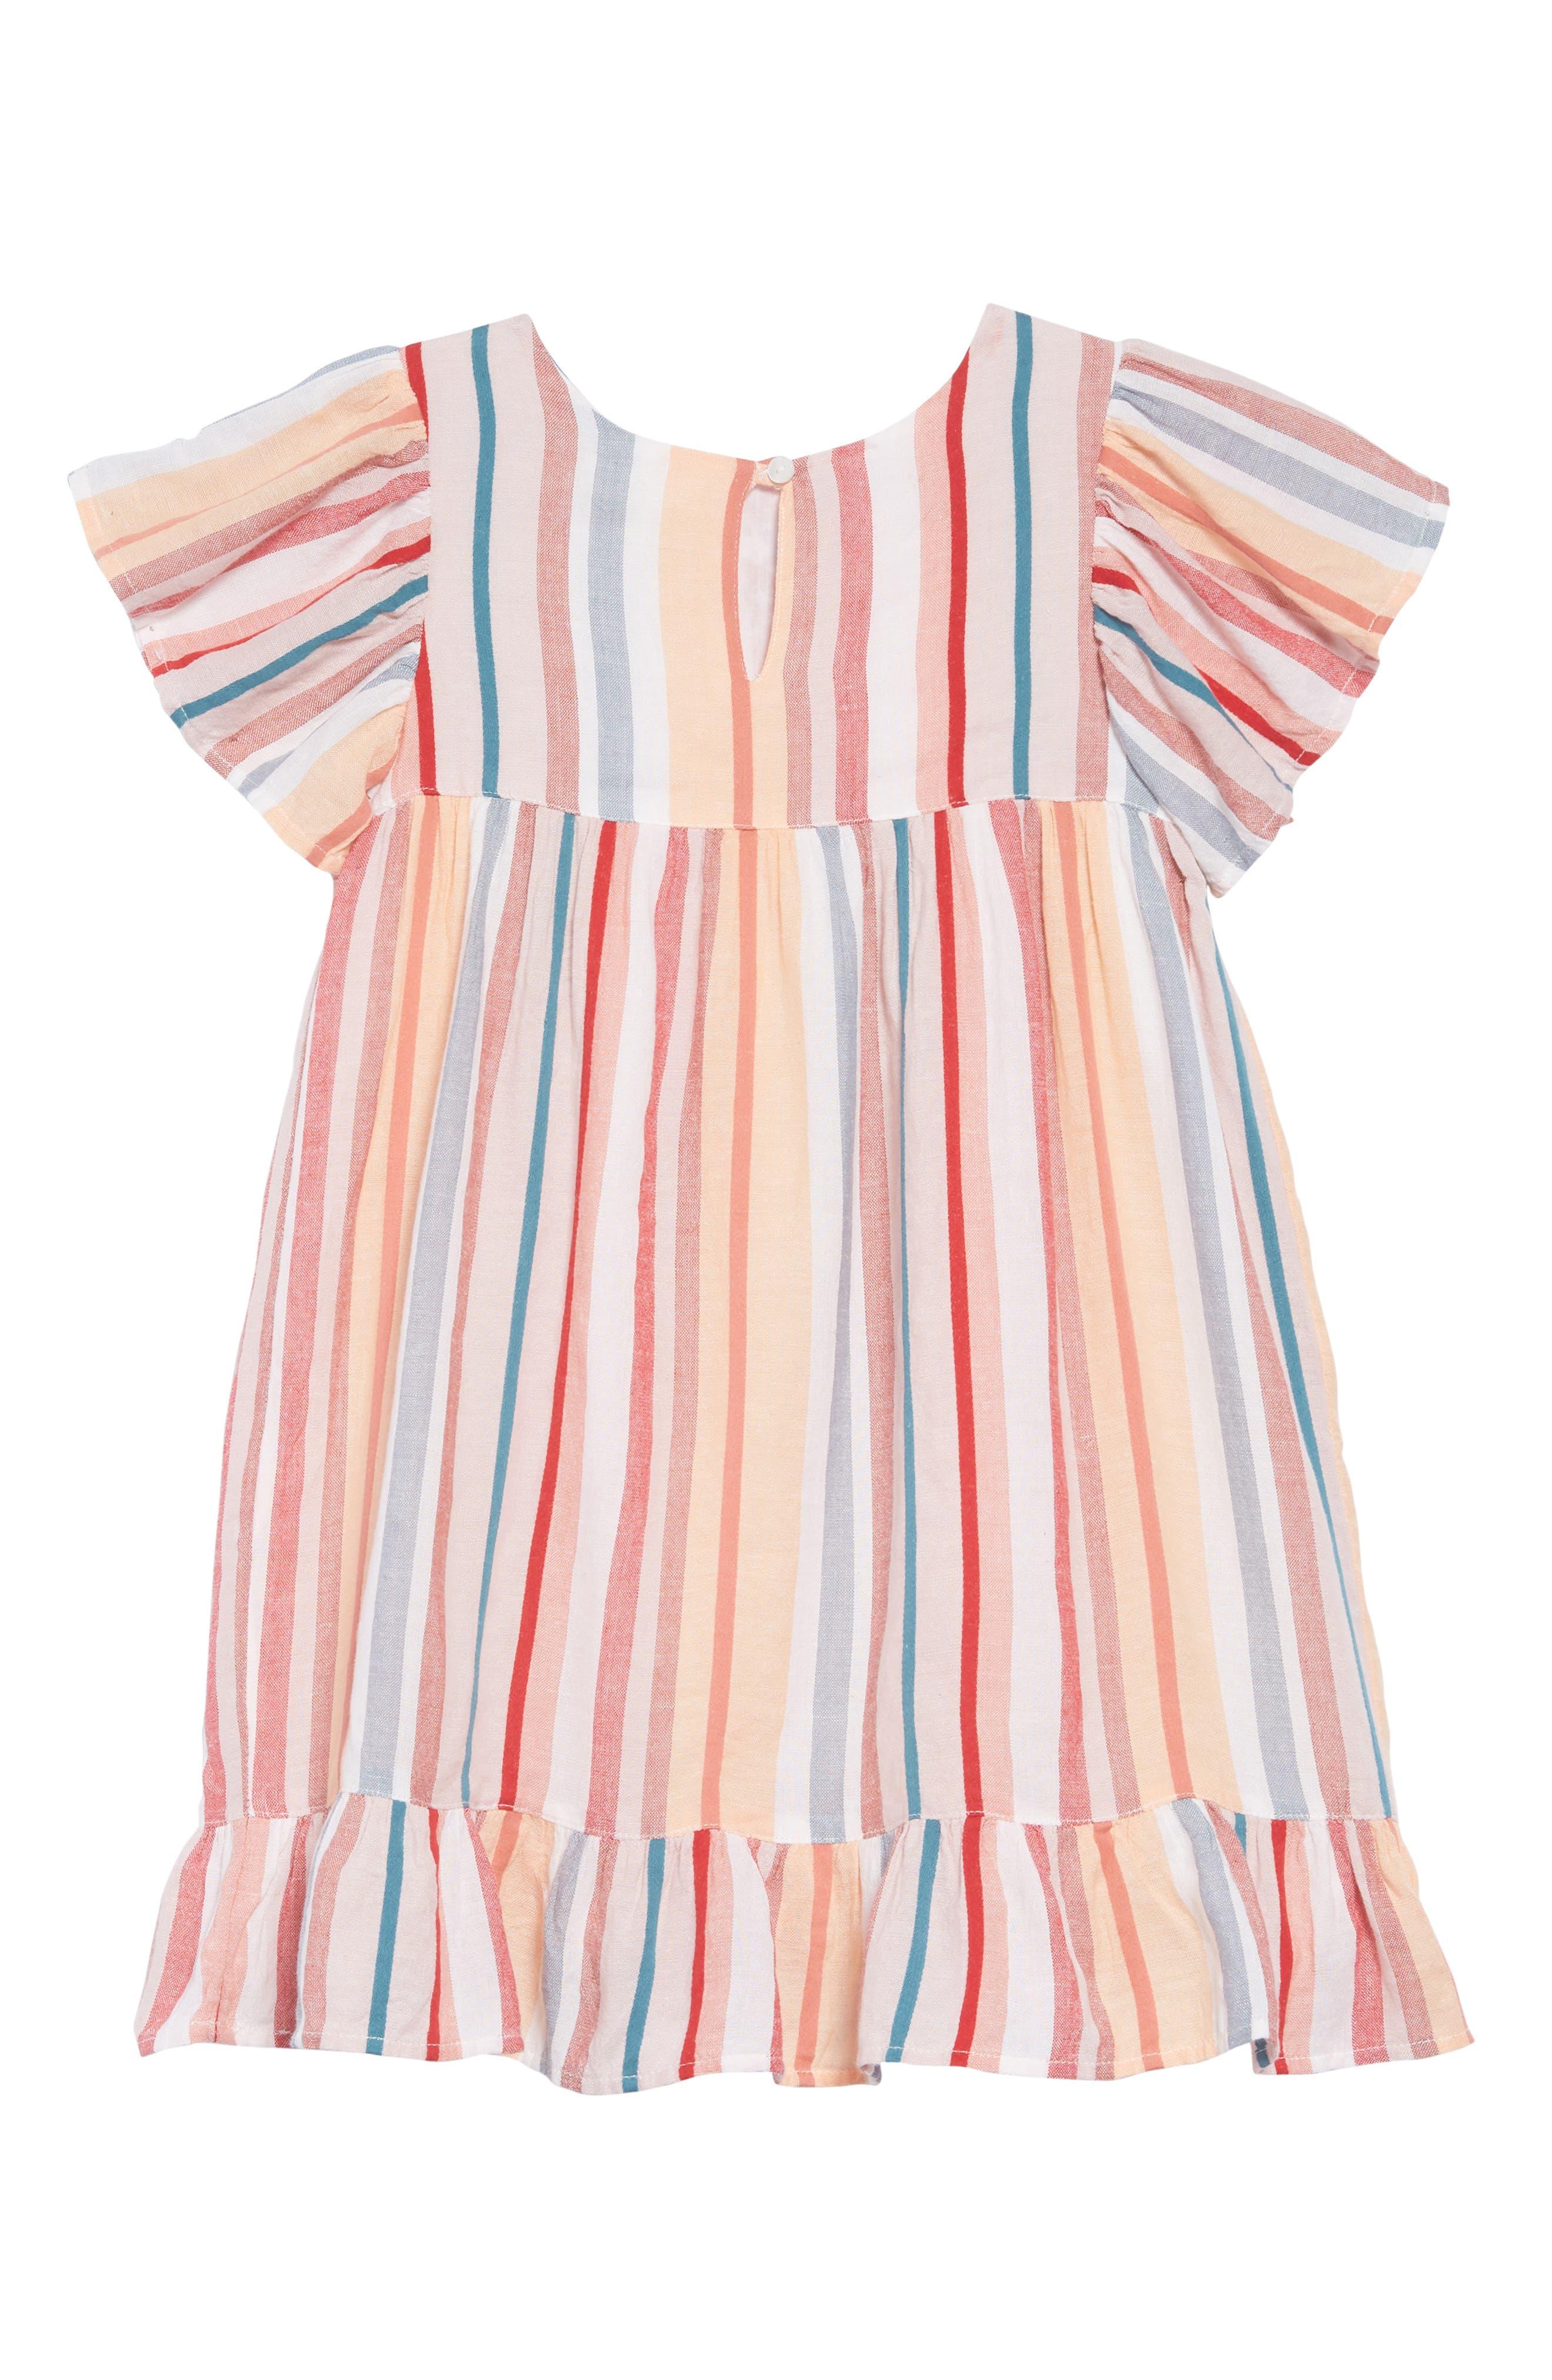 Embroidered Stripe Dress,                             Alternate thumbnail 2, color,                             IVORY EGRET MULTI STRIPE